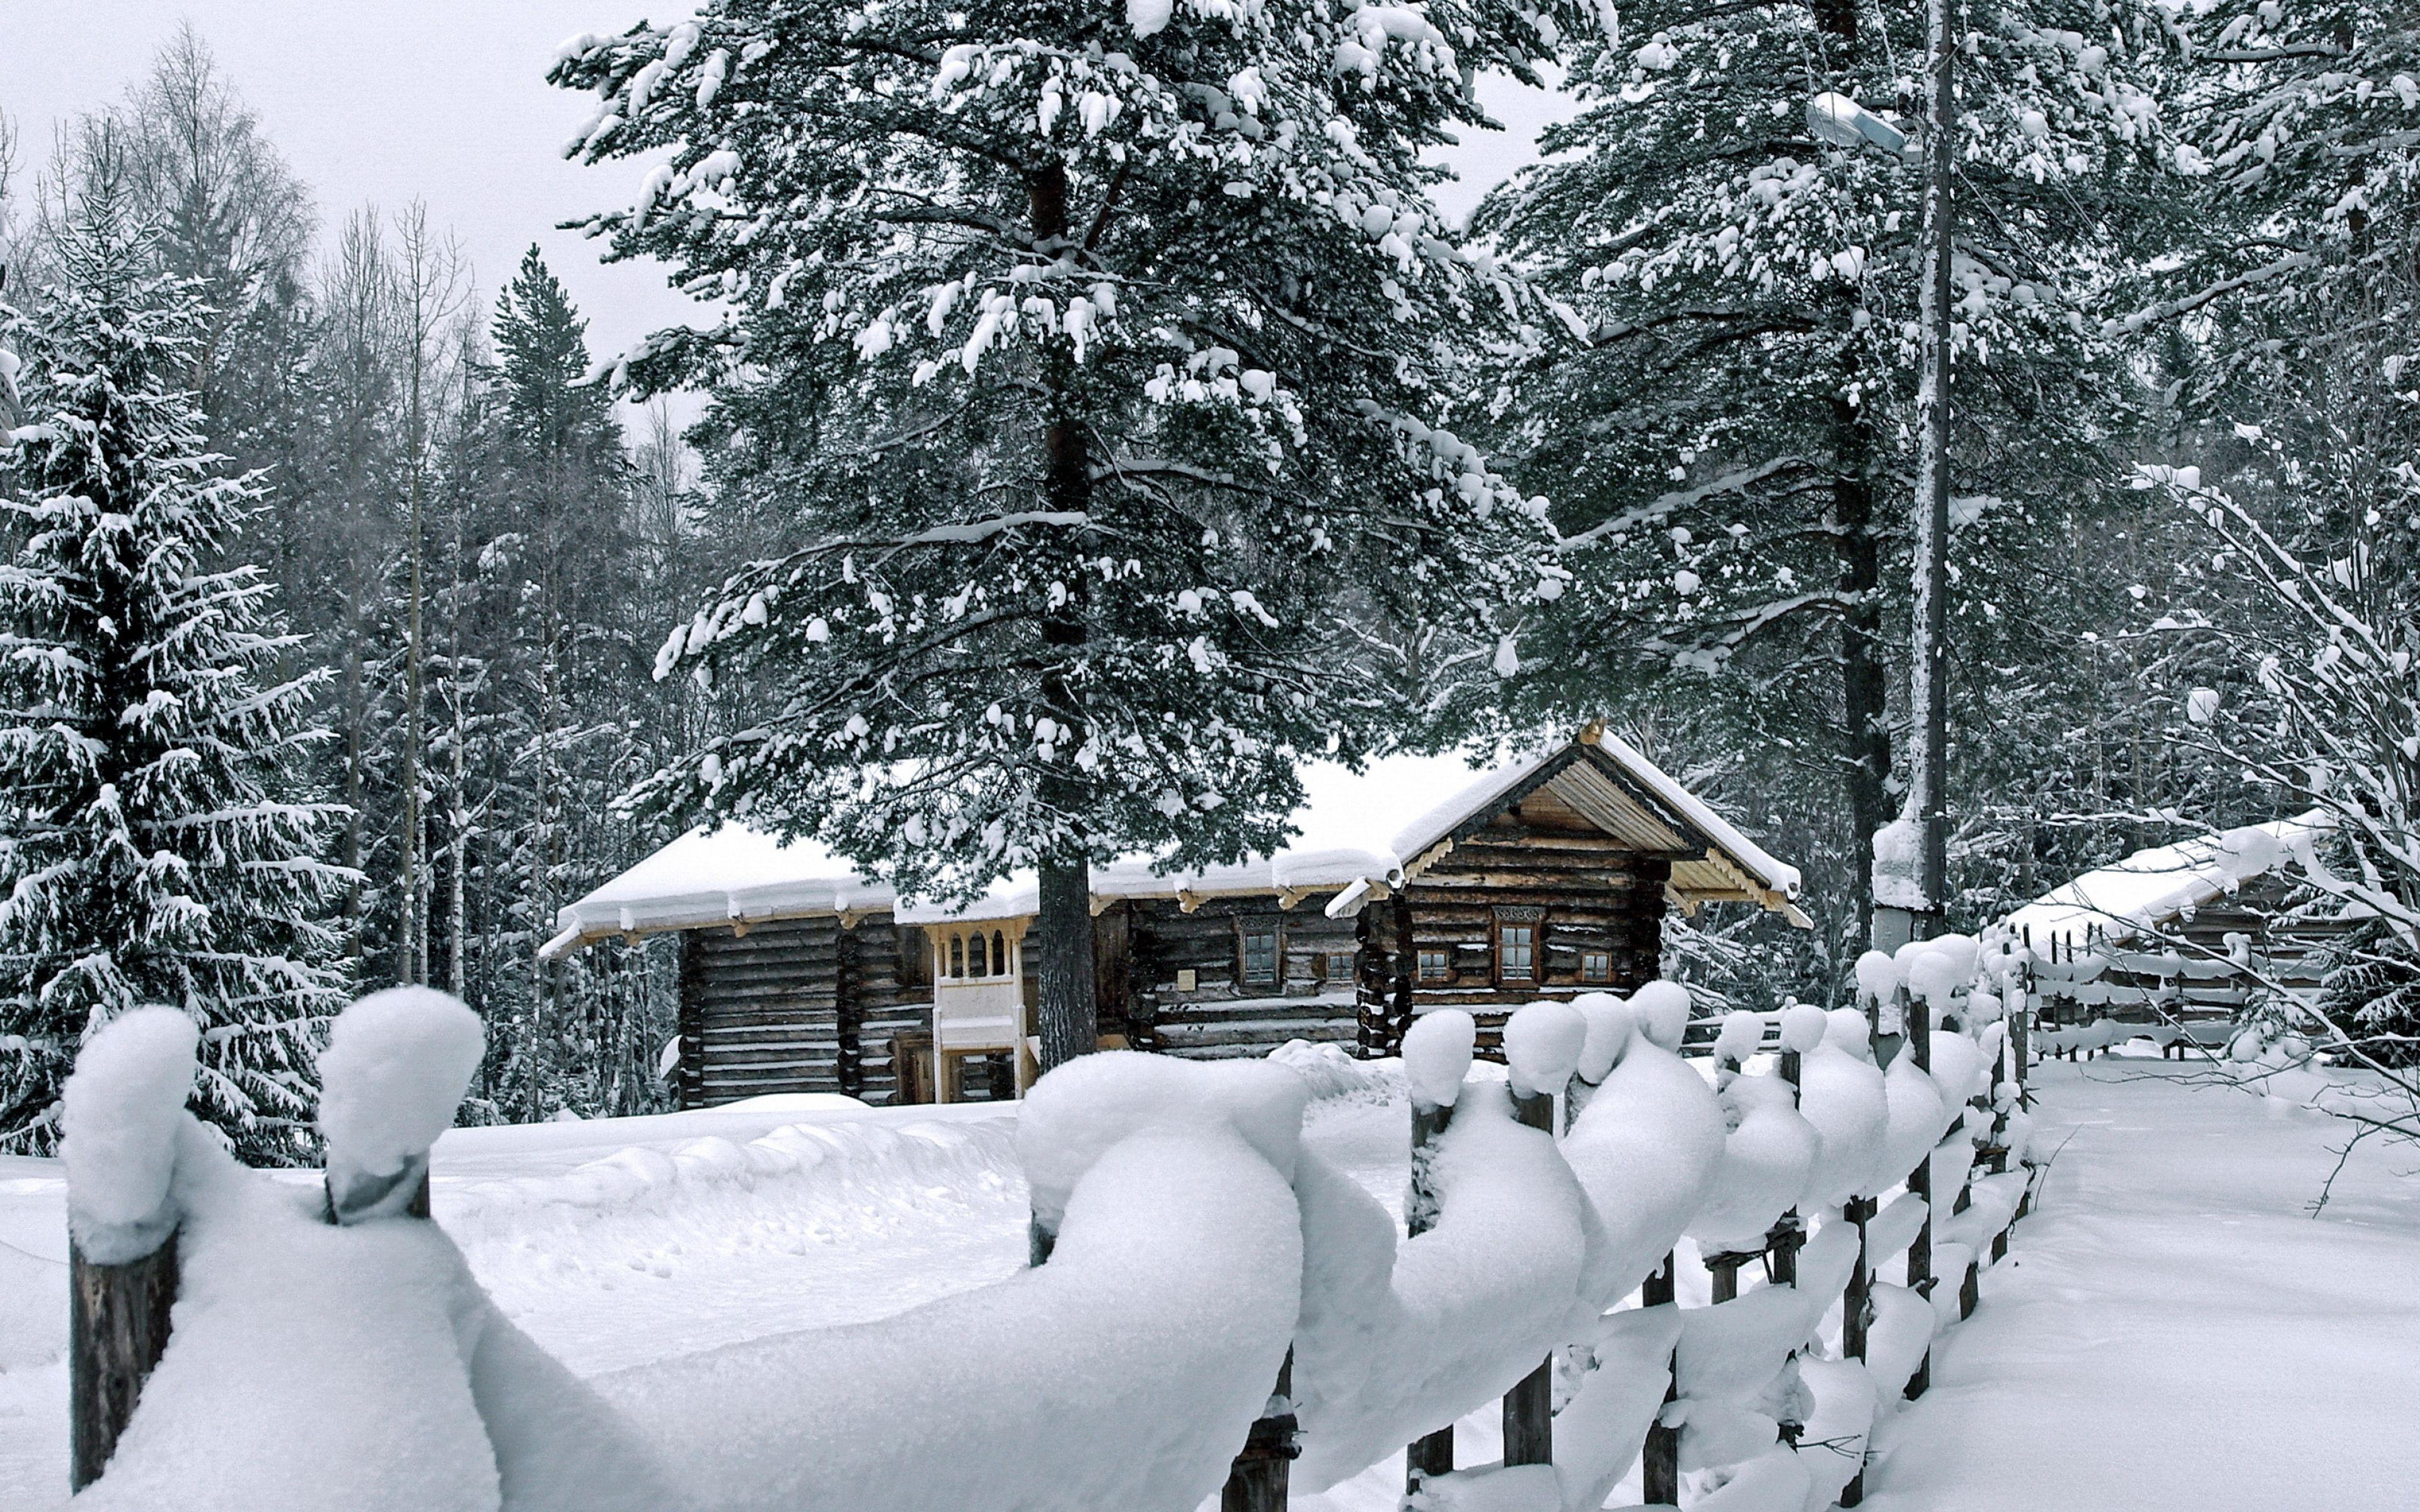 3840x2400 Wallpaper Fence Snow Snowdrifts Attire Pines House Log Hut